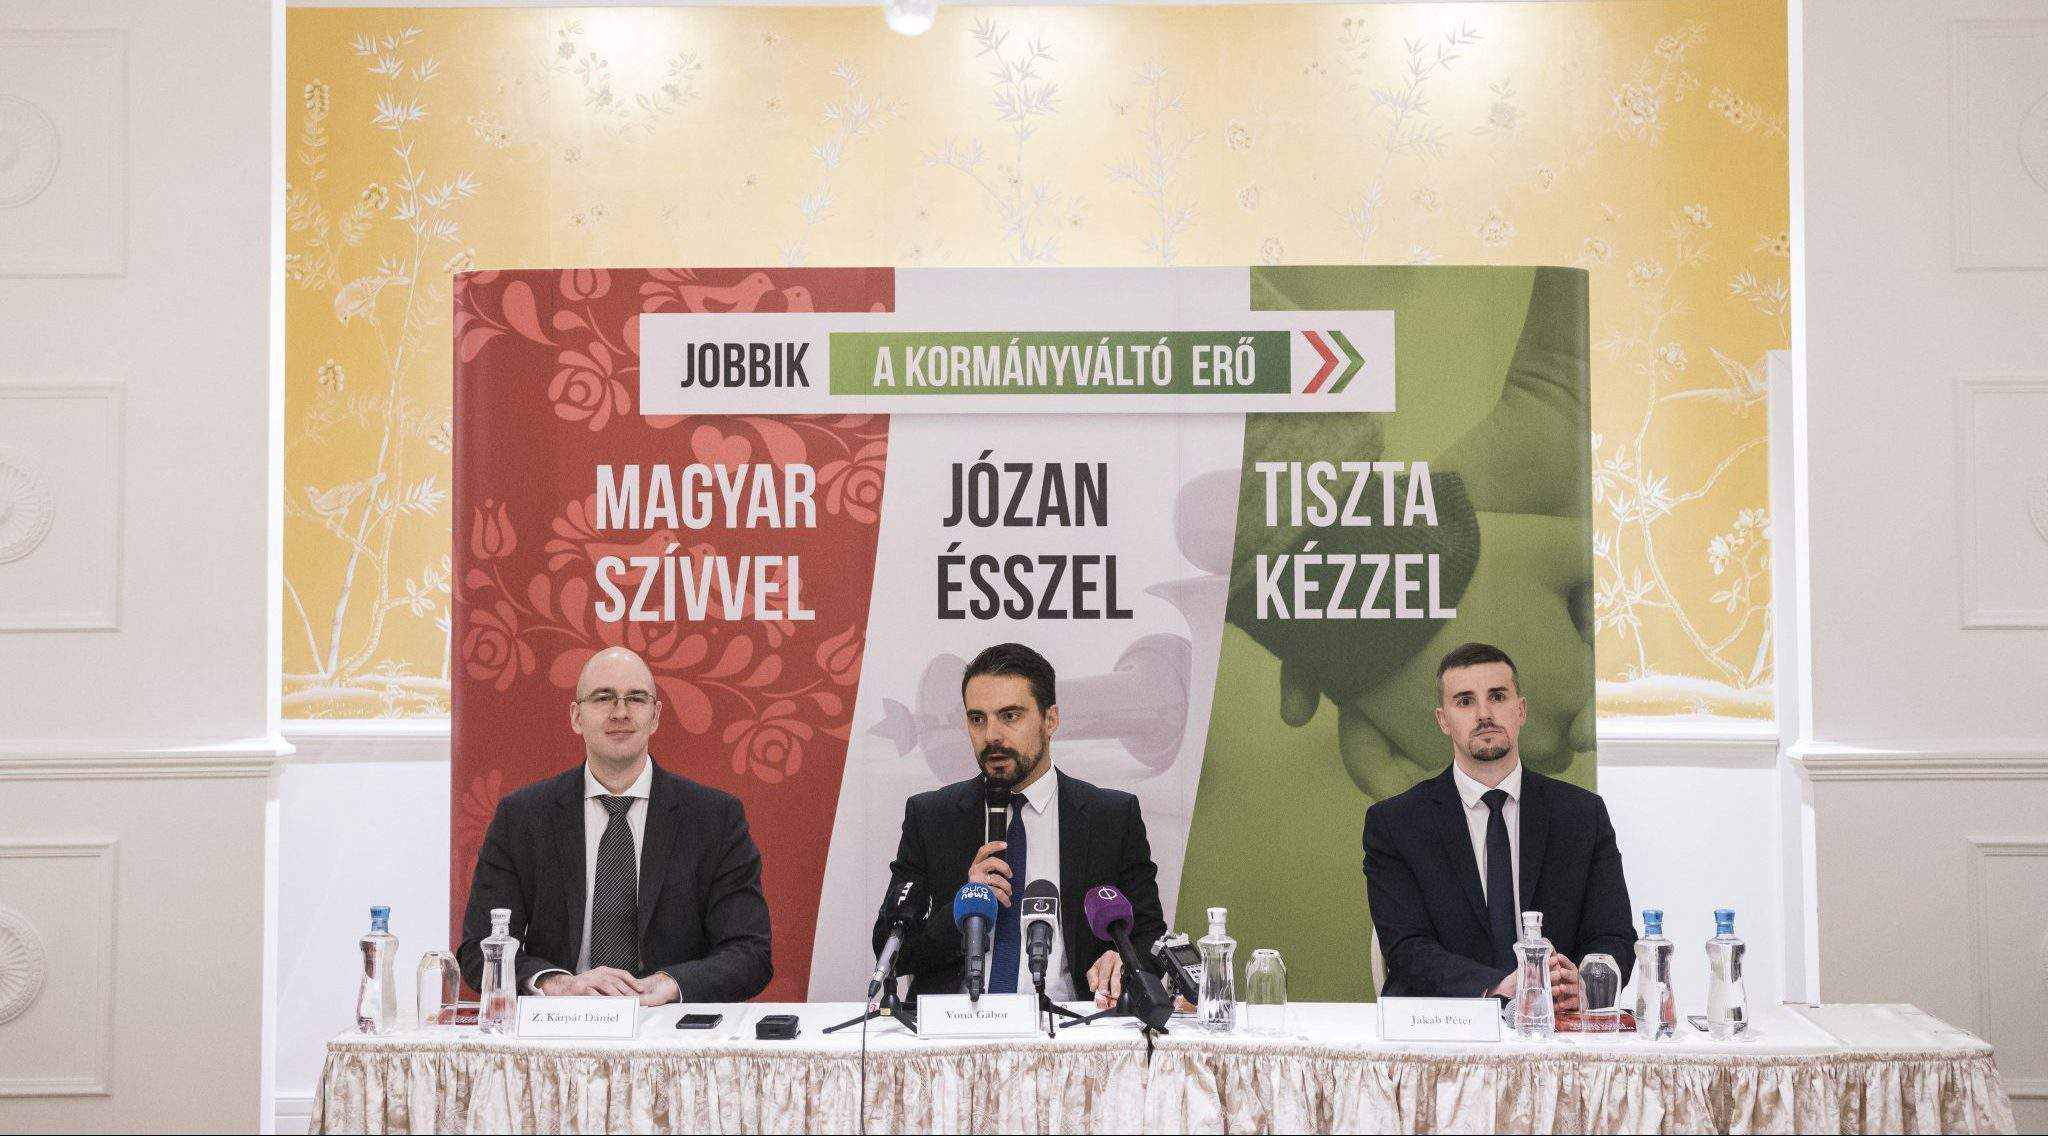 Jobbik election2018 manifesto